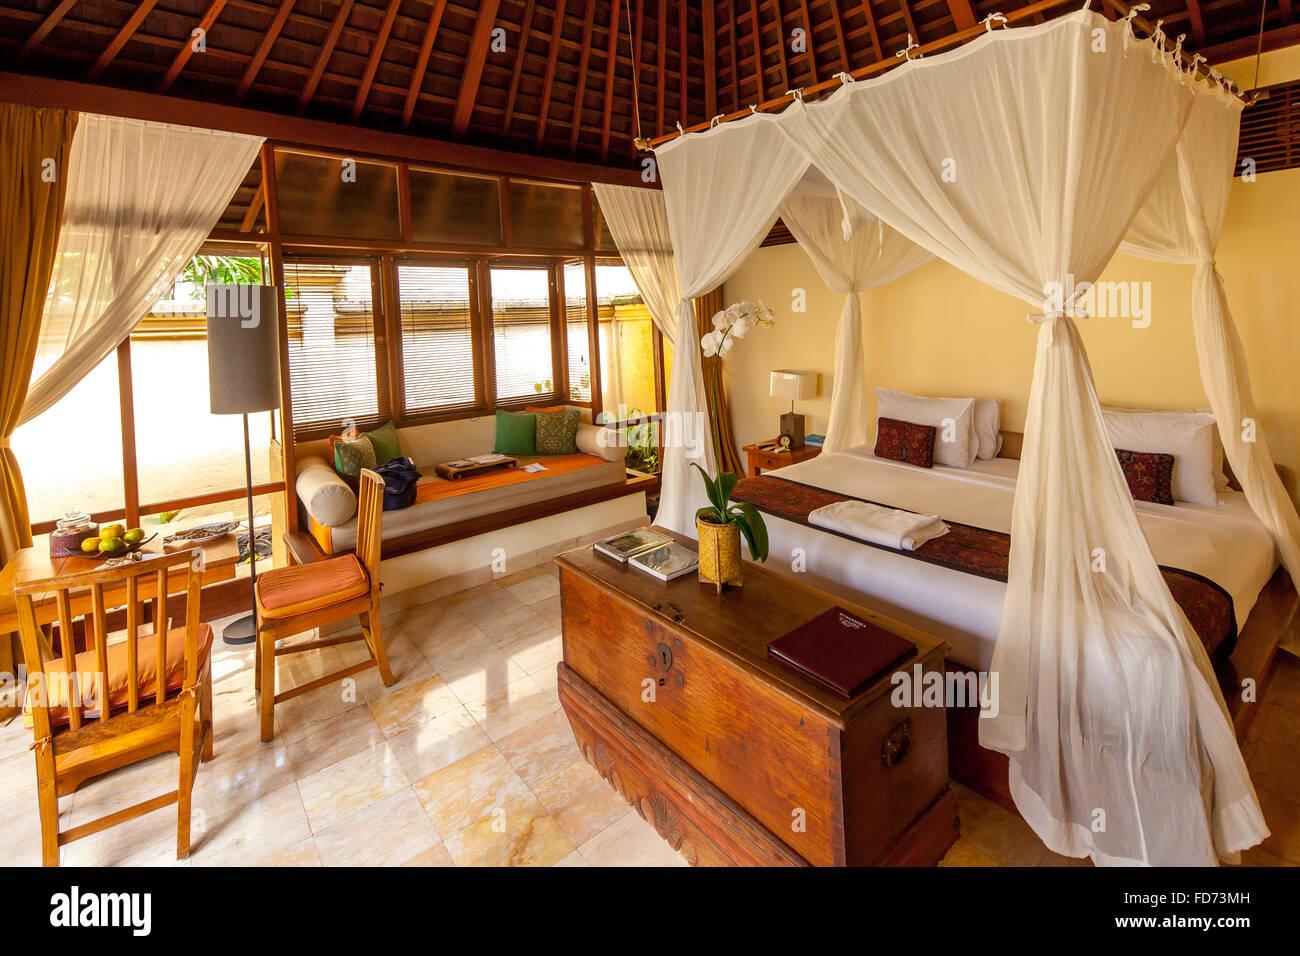 Hotelzimmer mit Himmelbett, Tourismus, Reisen, Ubud, Bali, Indonesien, Asien Stockbild